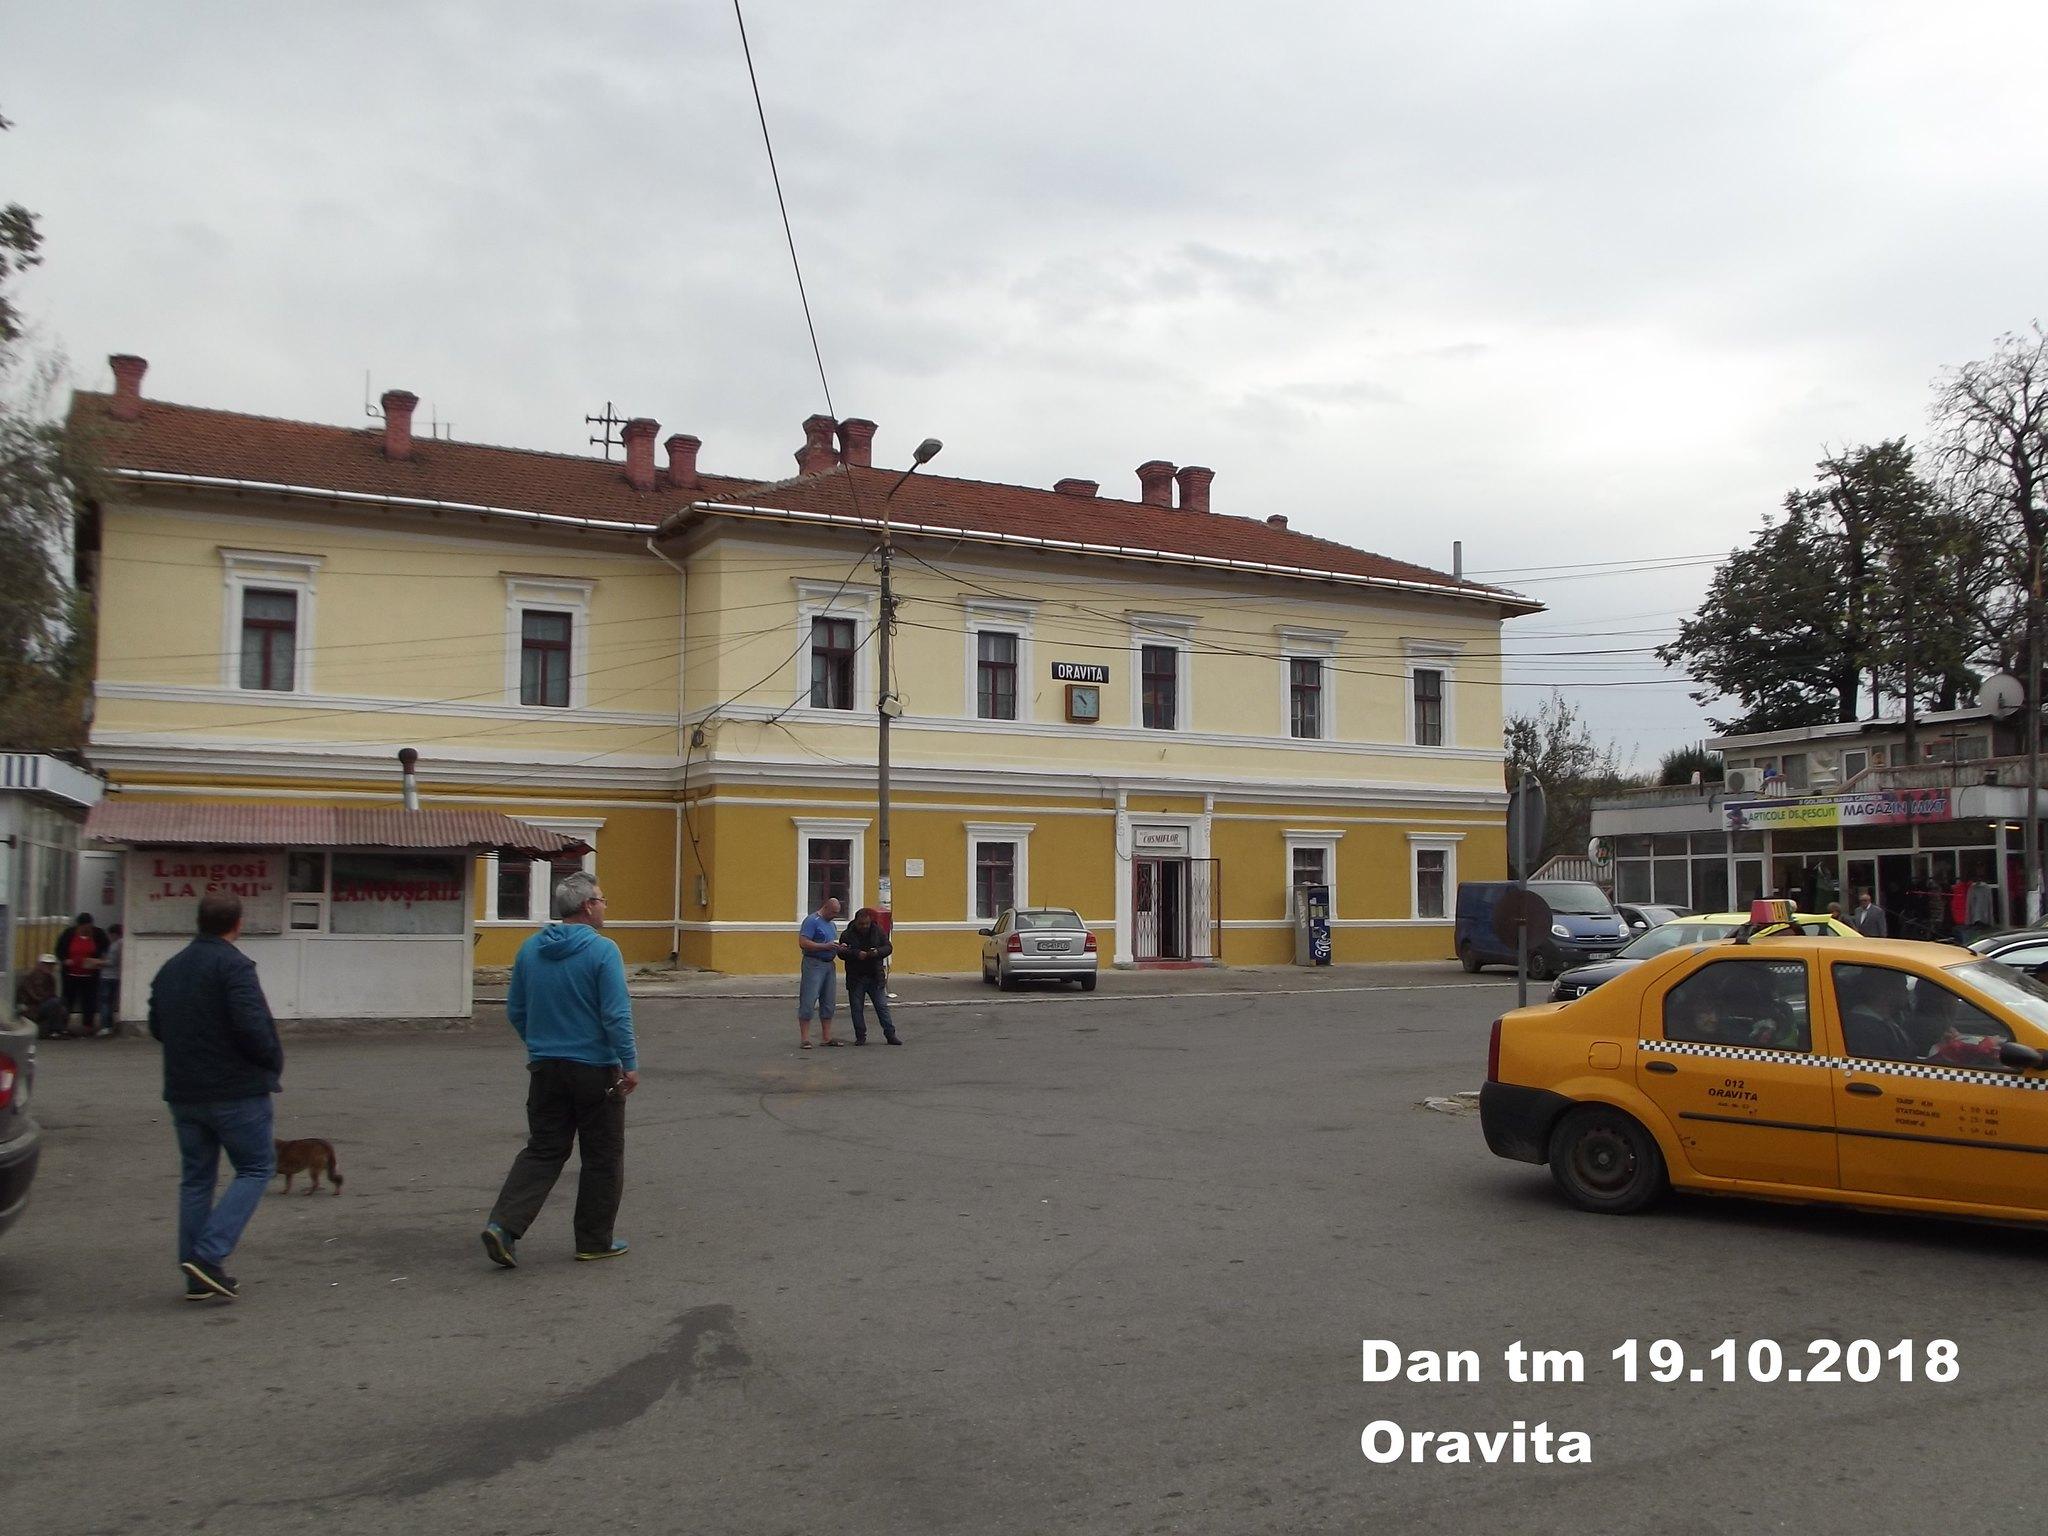 925 : Oravita - Anina - Pagina 40 44557102355_60f162add8_k